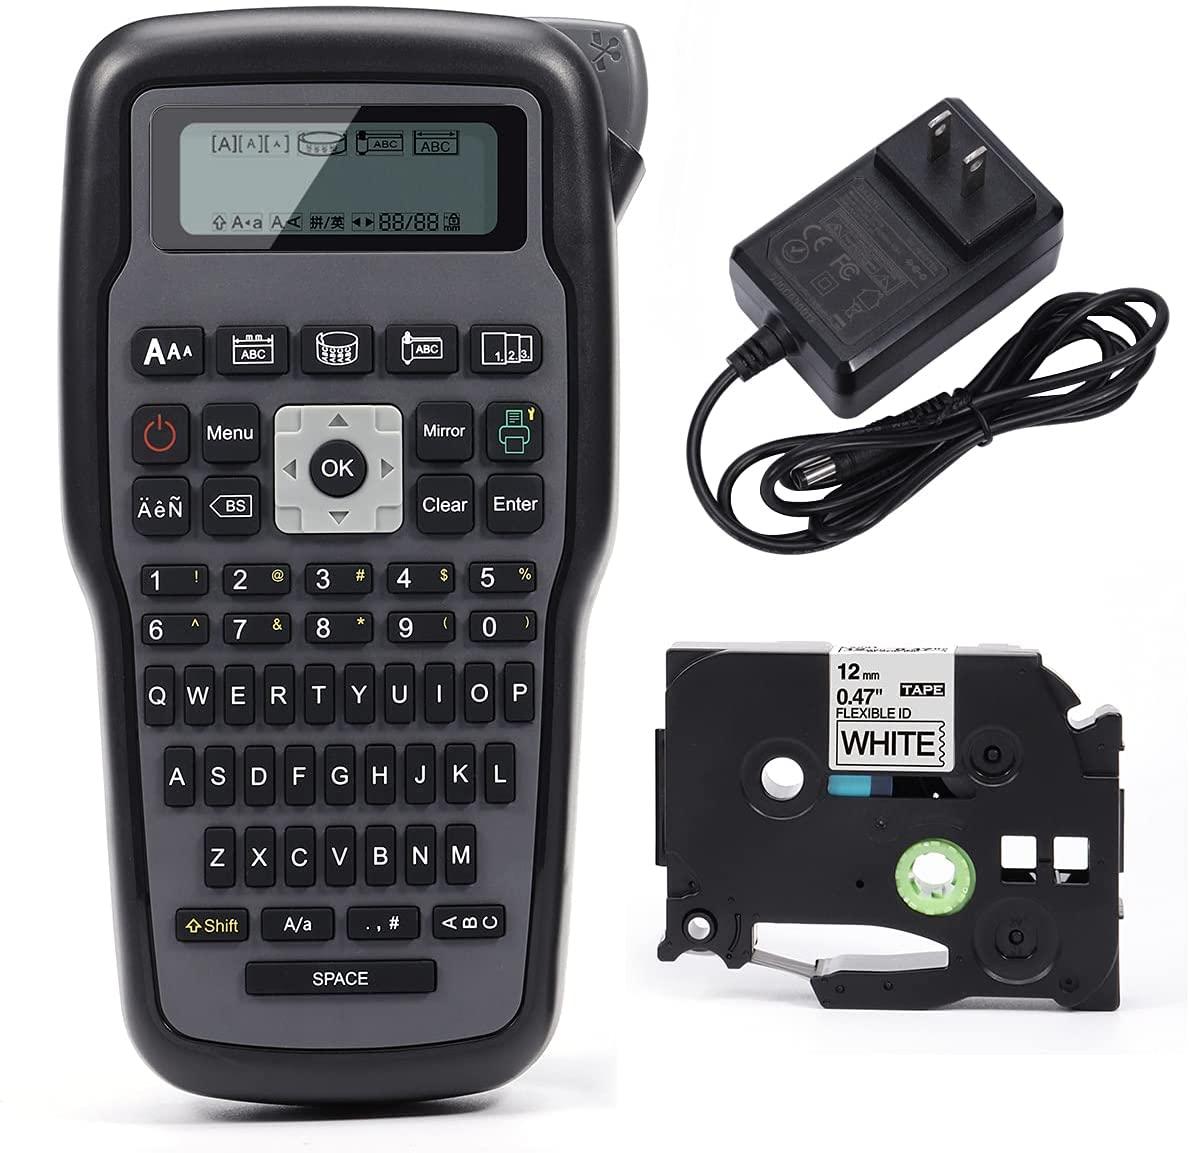 E1000 برو طابعة صانع التسمية الصناعية استبدال P اللمس TZe شريط ملصقات لوحة مفاتيح كويرتي رموز متعددة ماكينة طباعة الباركود